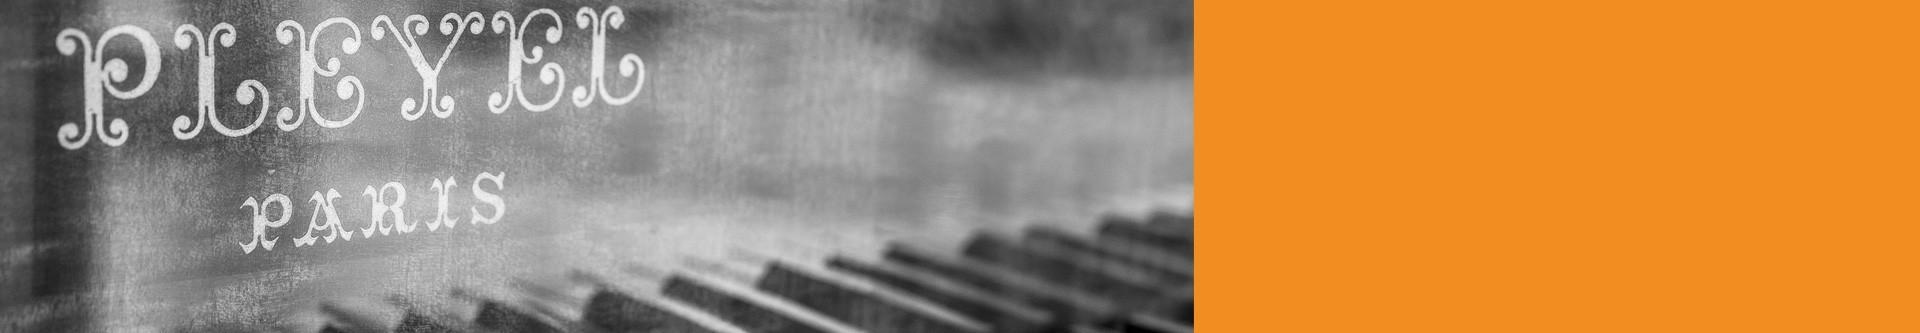 Pianos rares et anciens Prévalet Musique Dijon